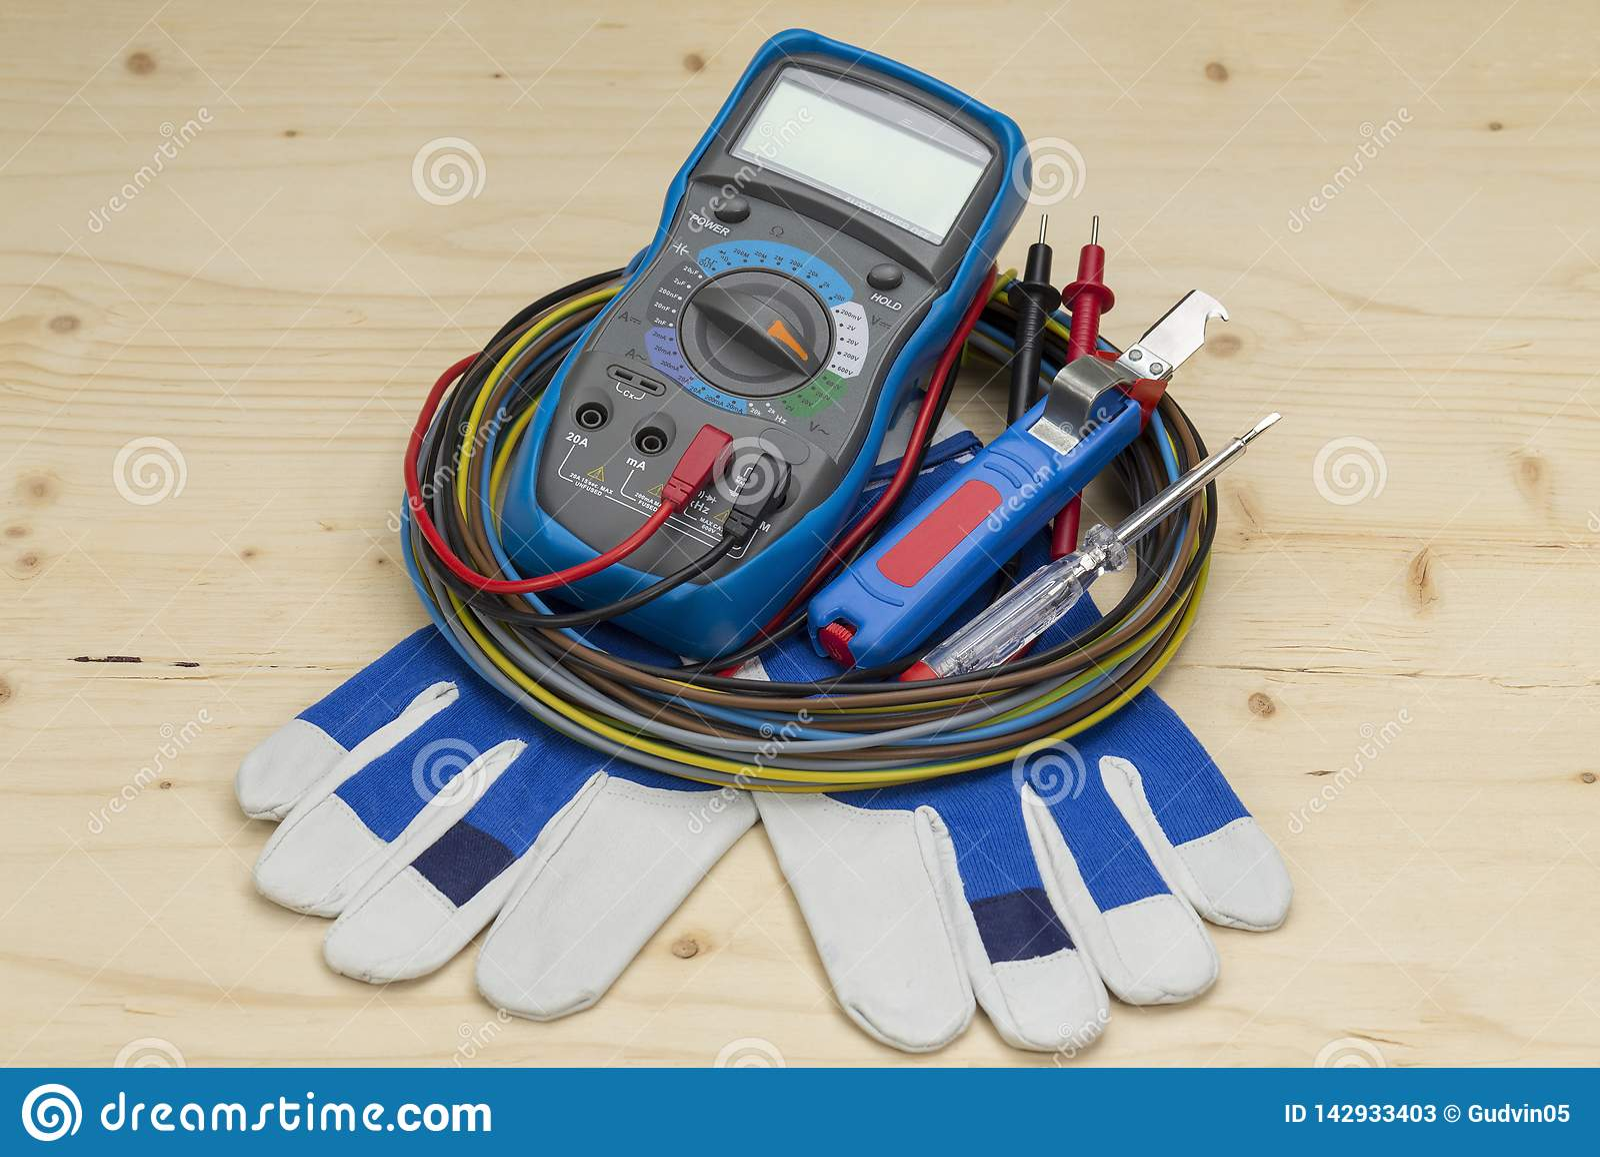 Multimeter measuring device electric tool